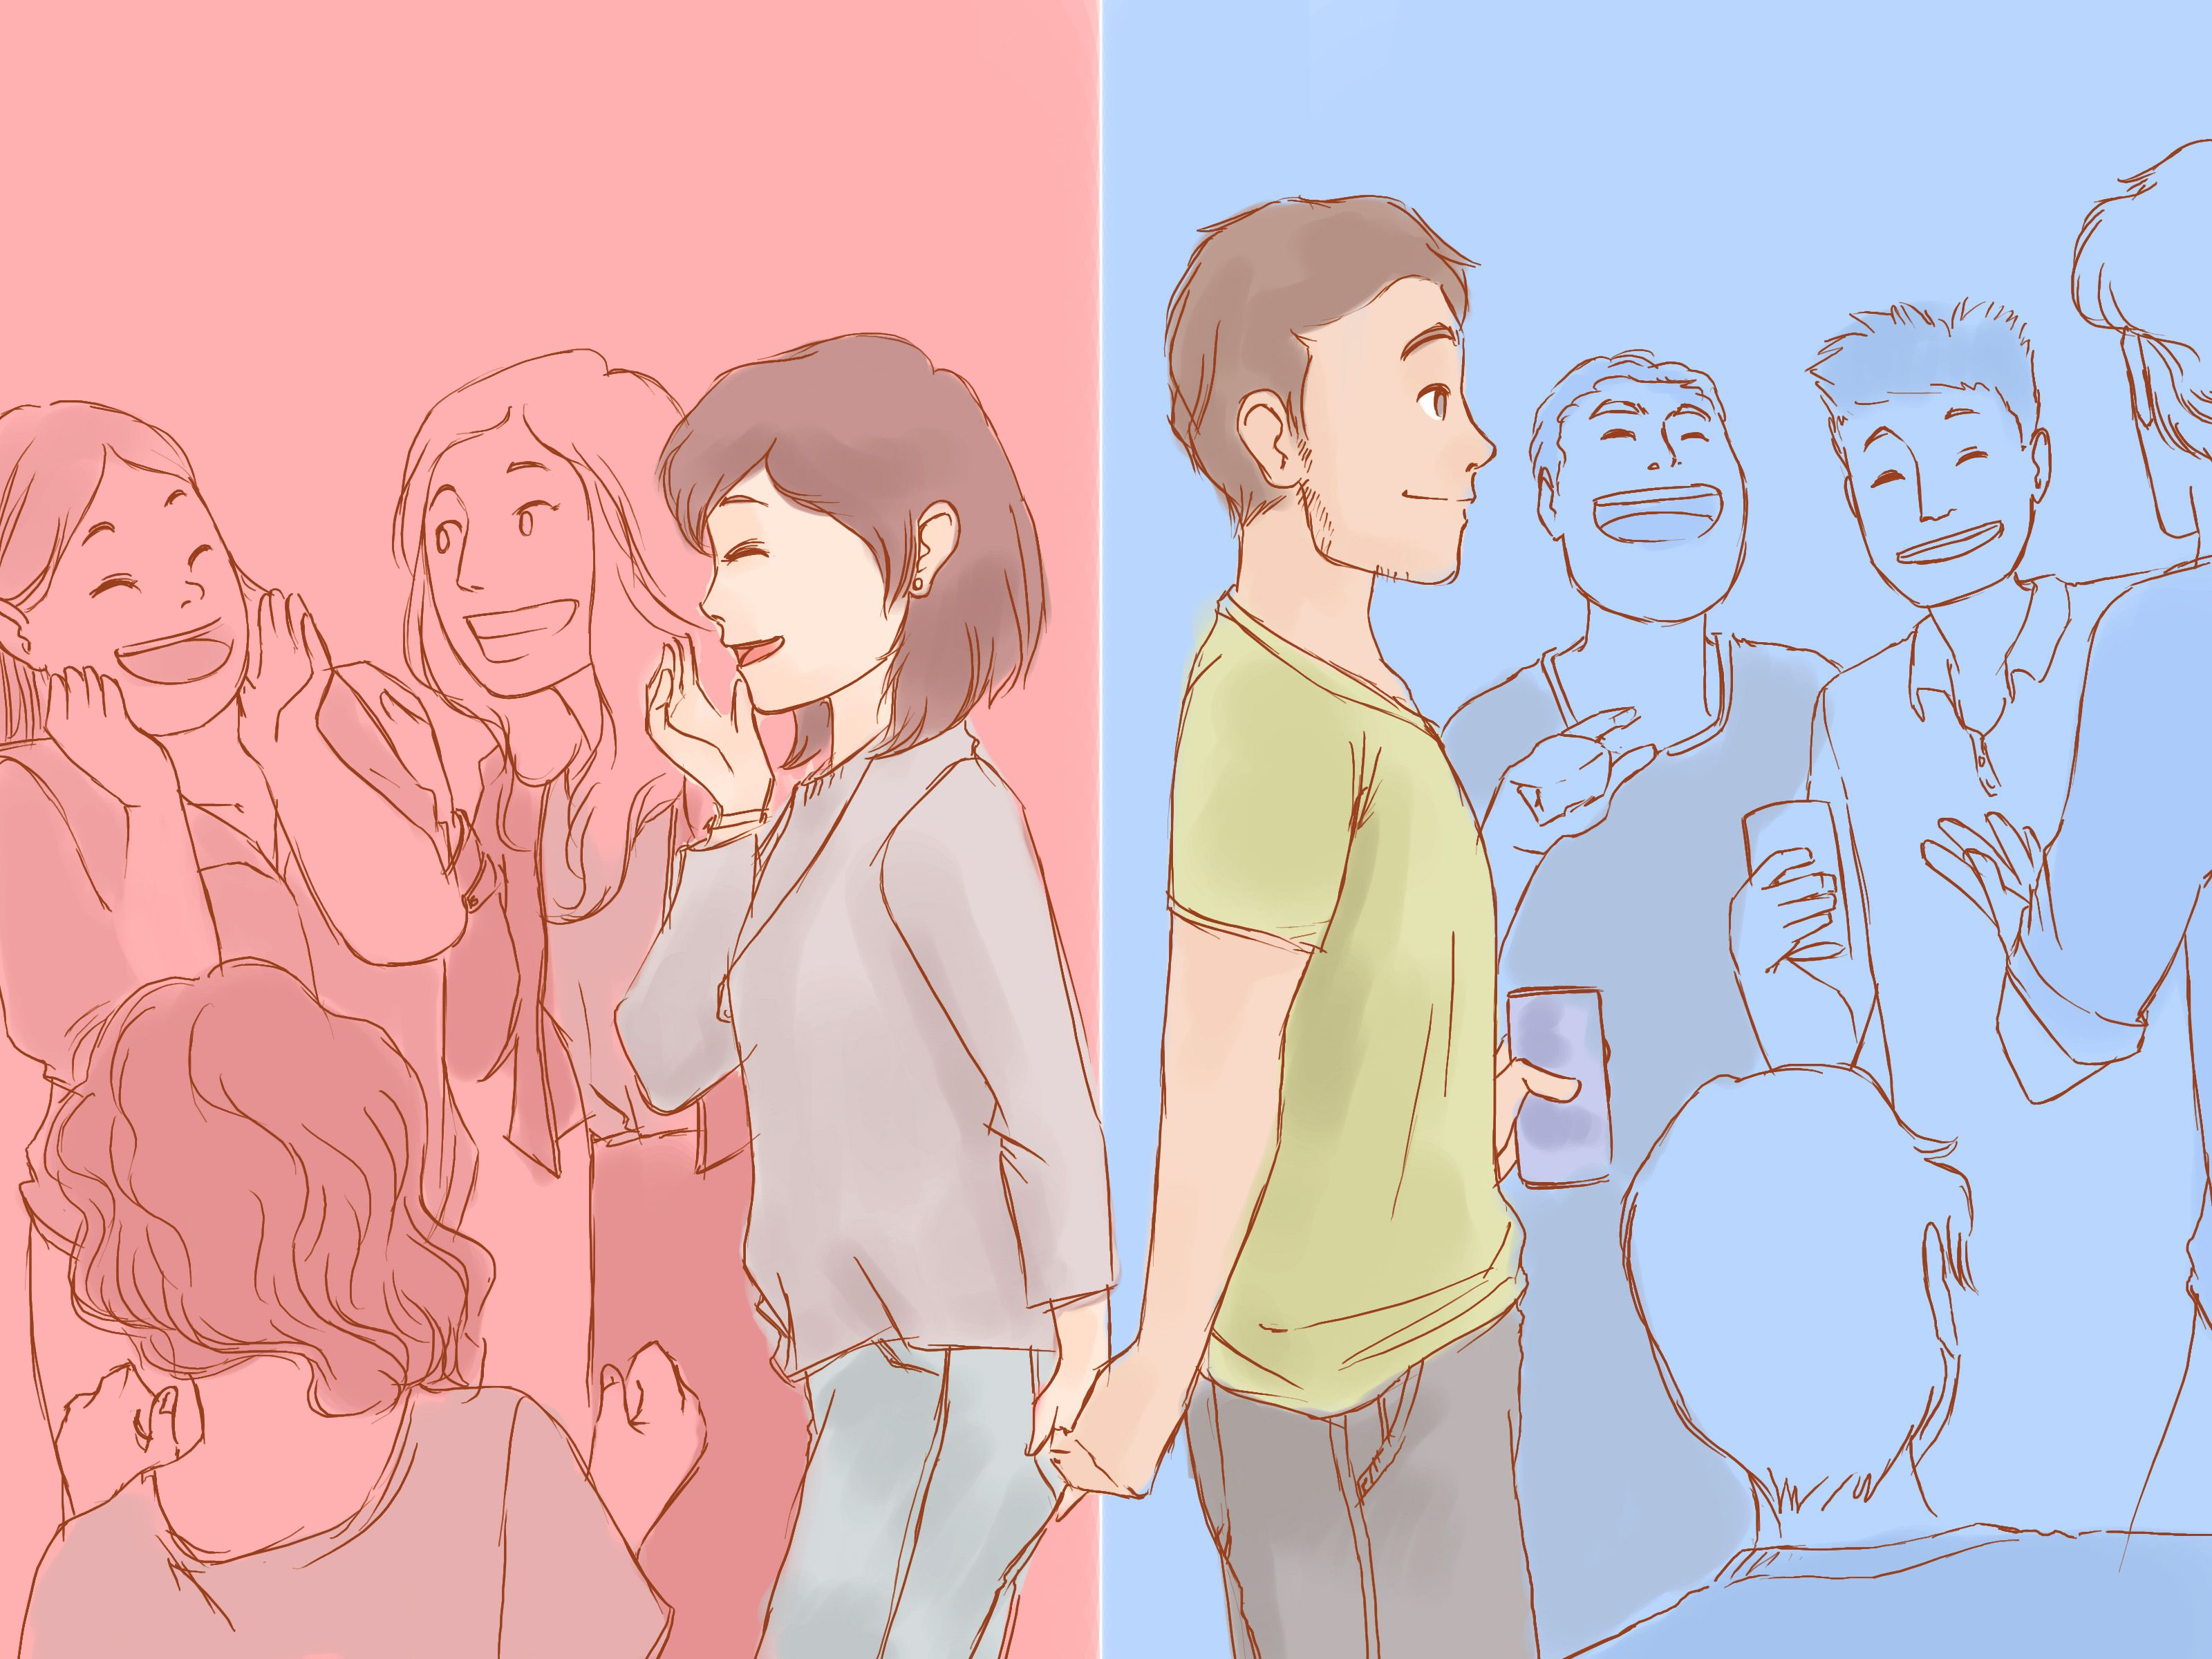 How to Be a Good Boyfriend -- via wikiHow.com